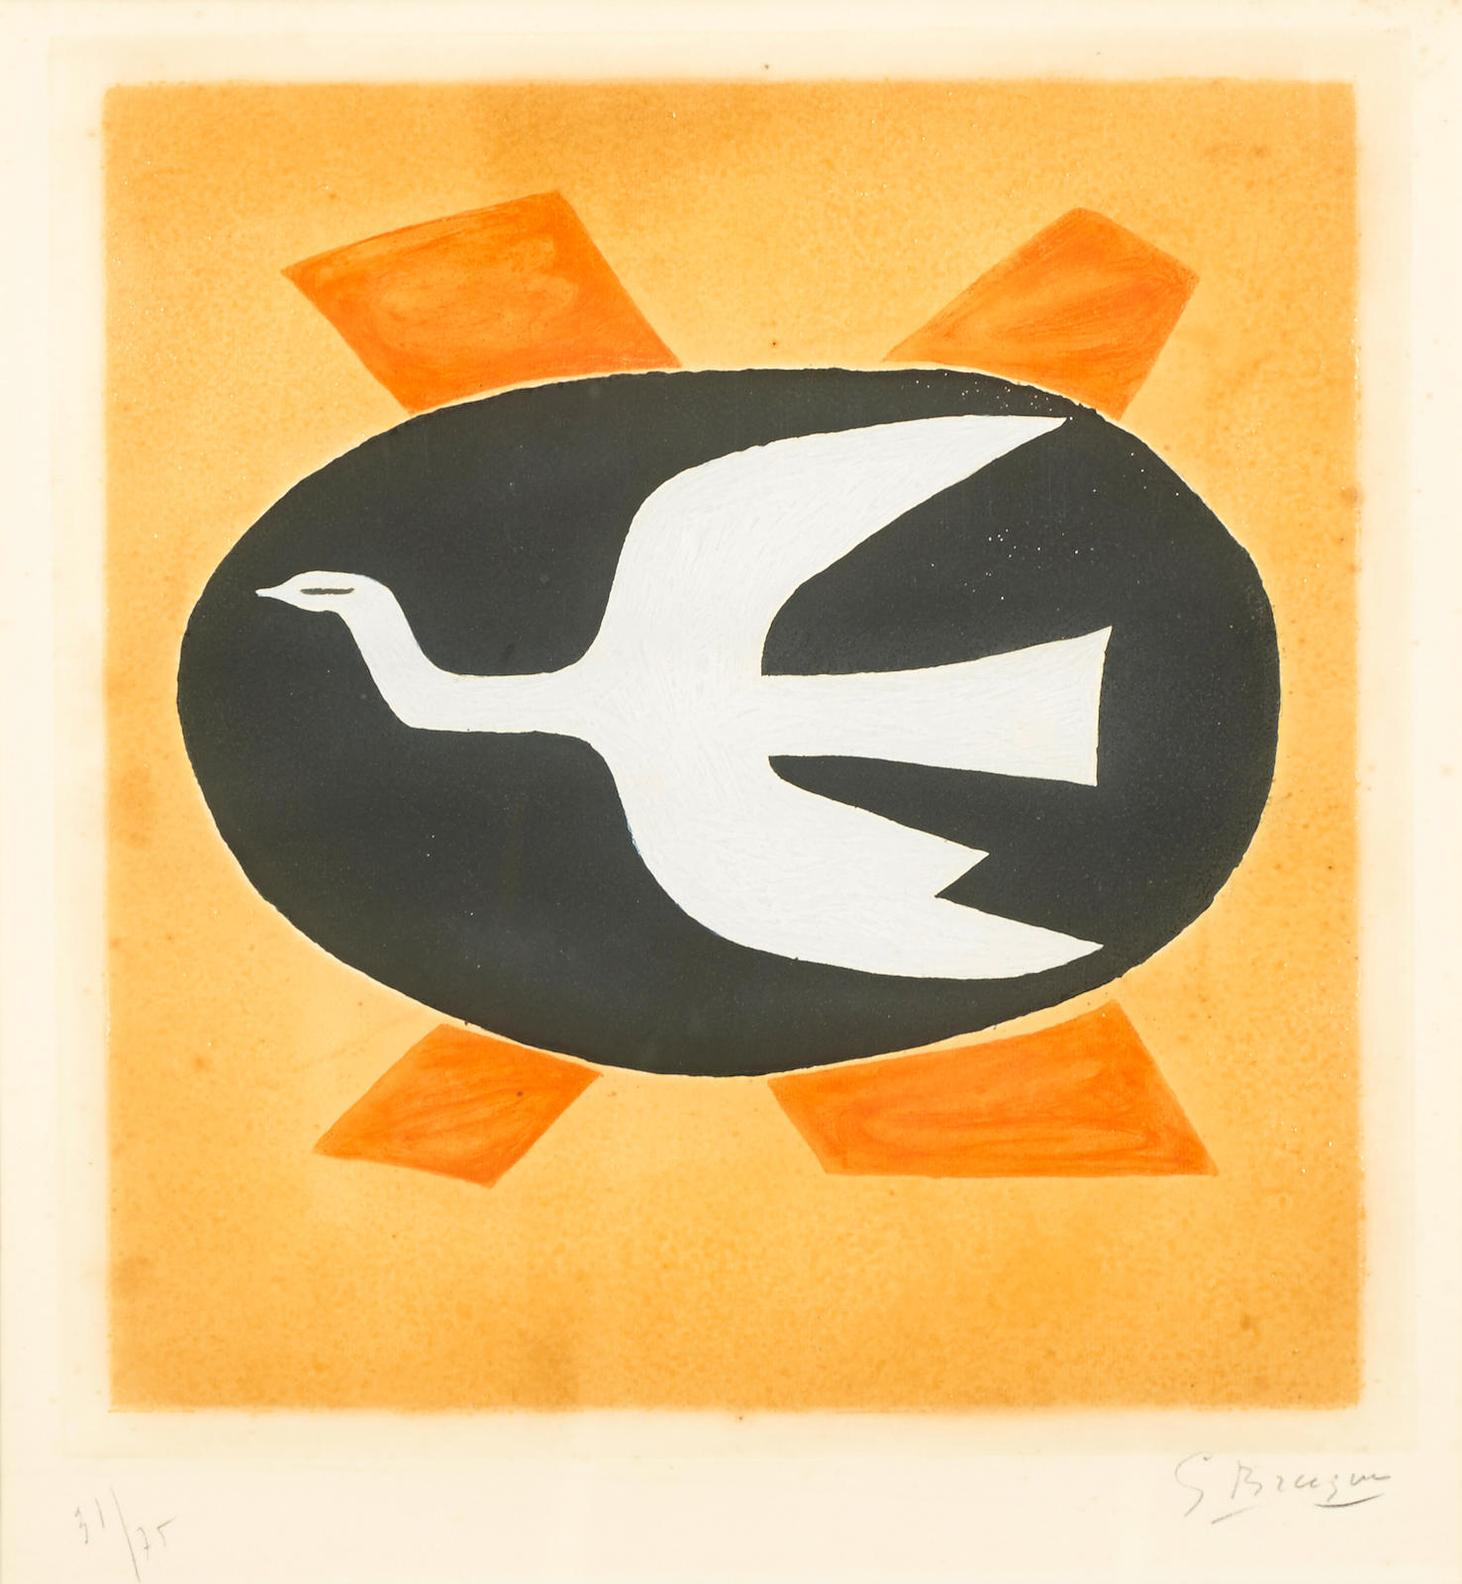 Georges Braque-Loiseau De Feu (Oiseau XIII)-1958